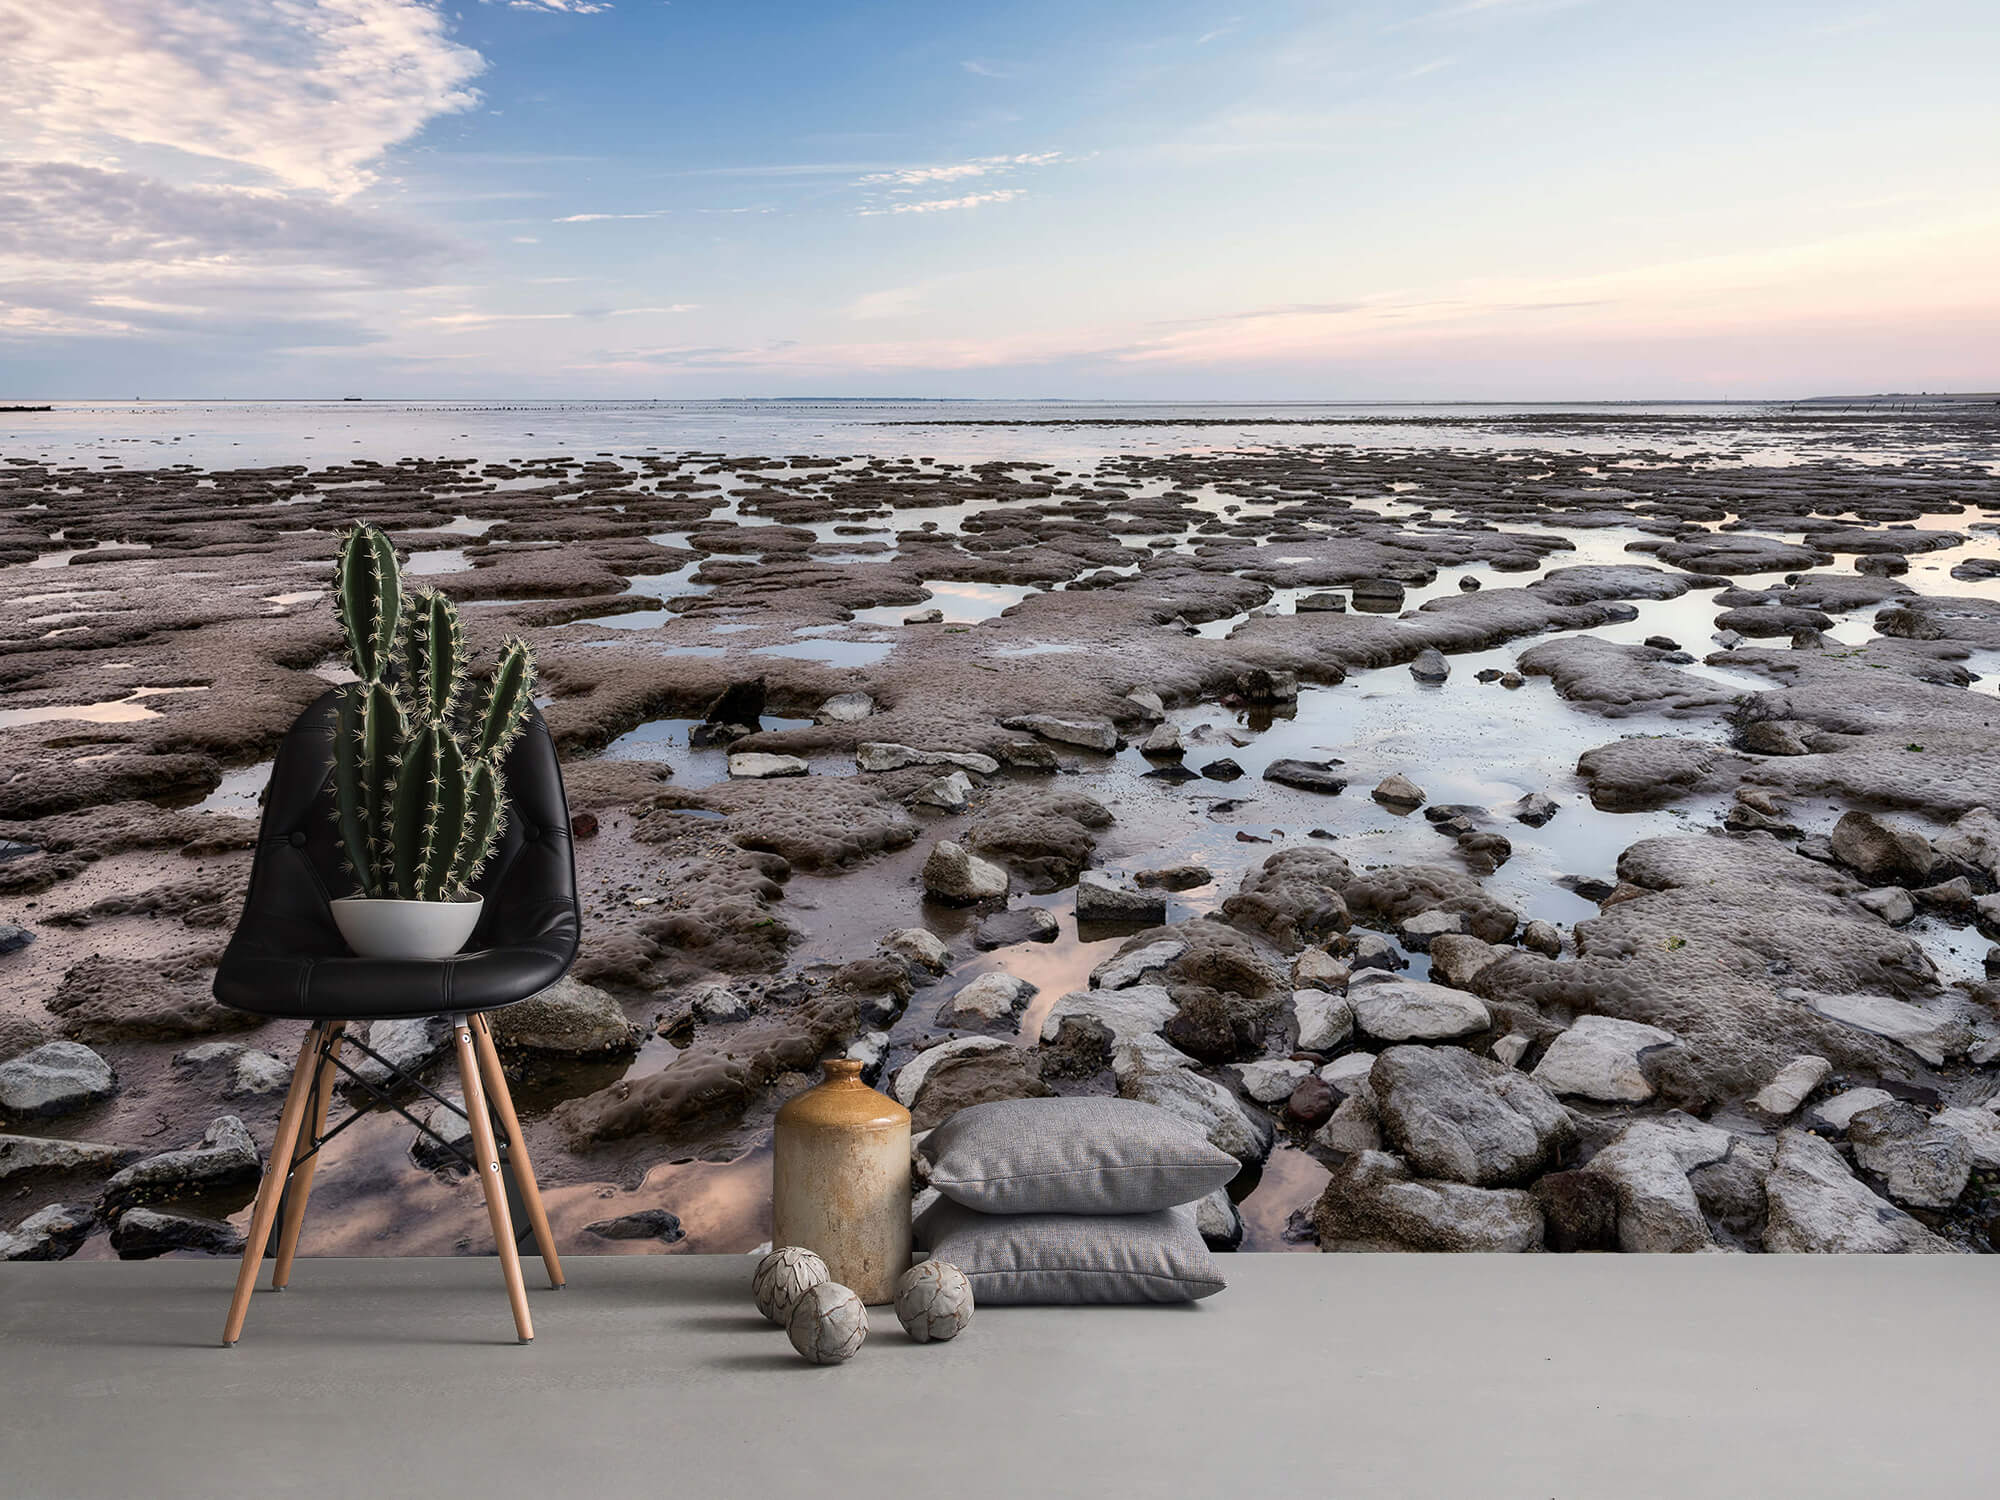 Strand - Stenen langs de kust 13